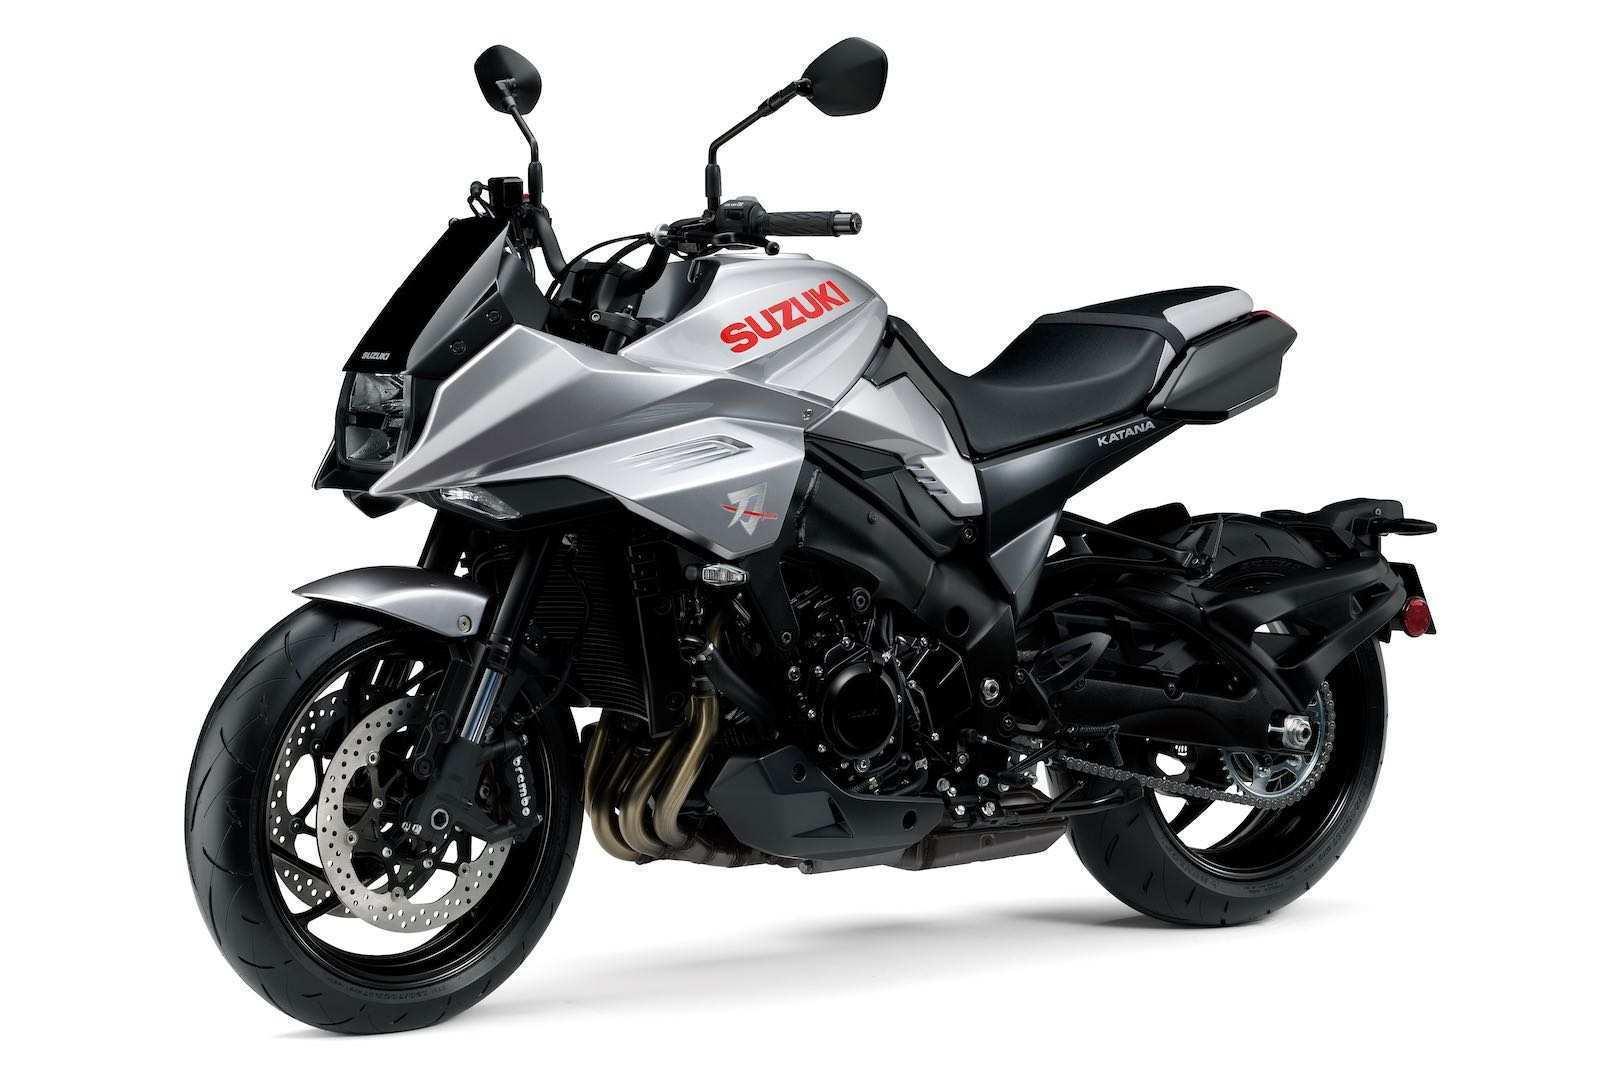 64 Concept of 2019 Suzuki Katana Pictures by 2019 Suzuki Katana